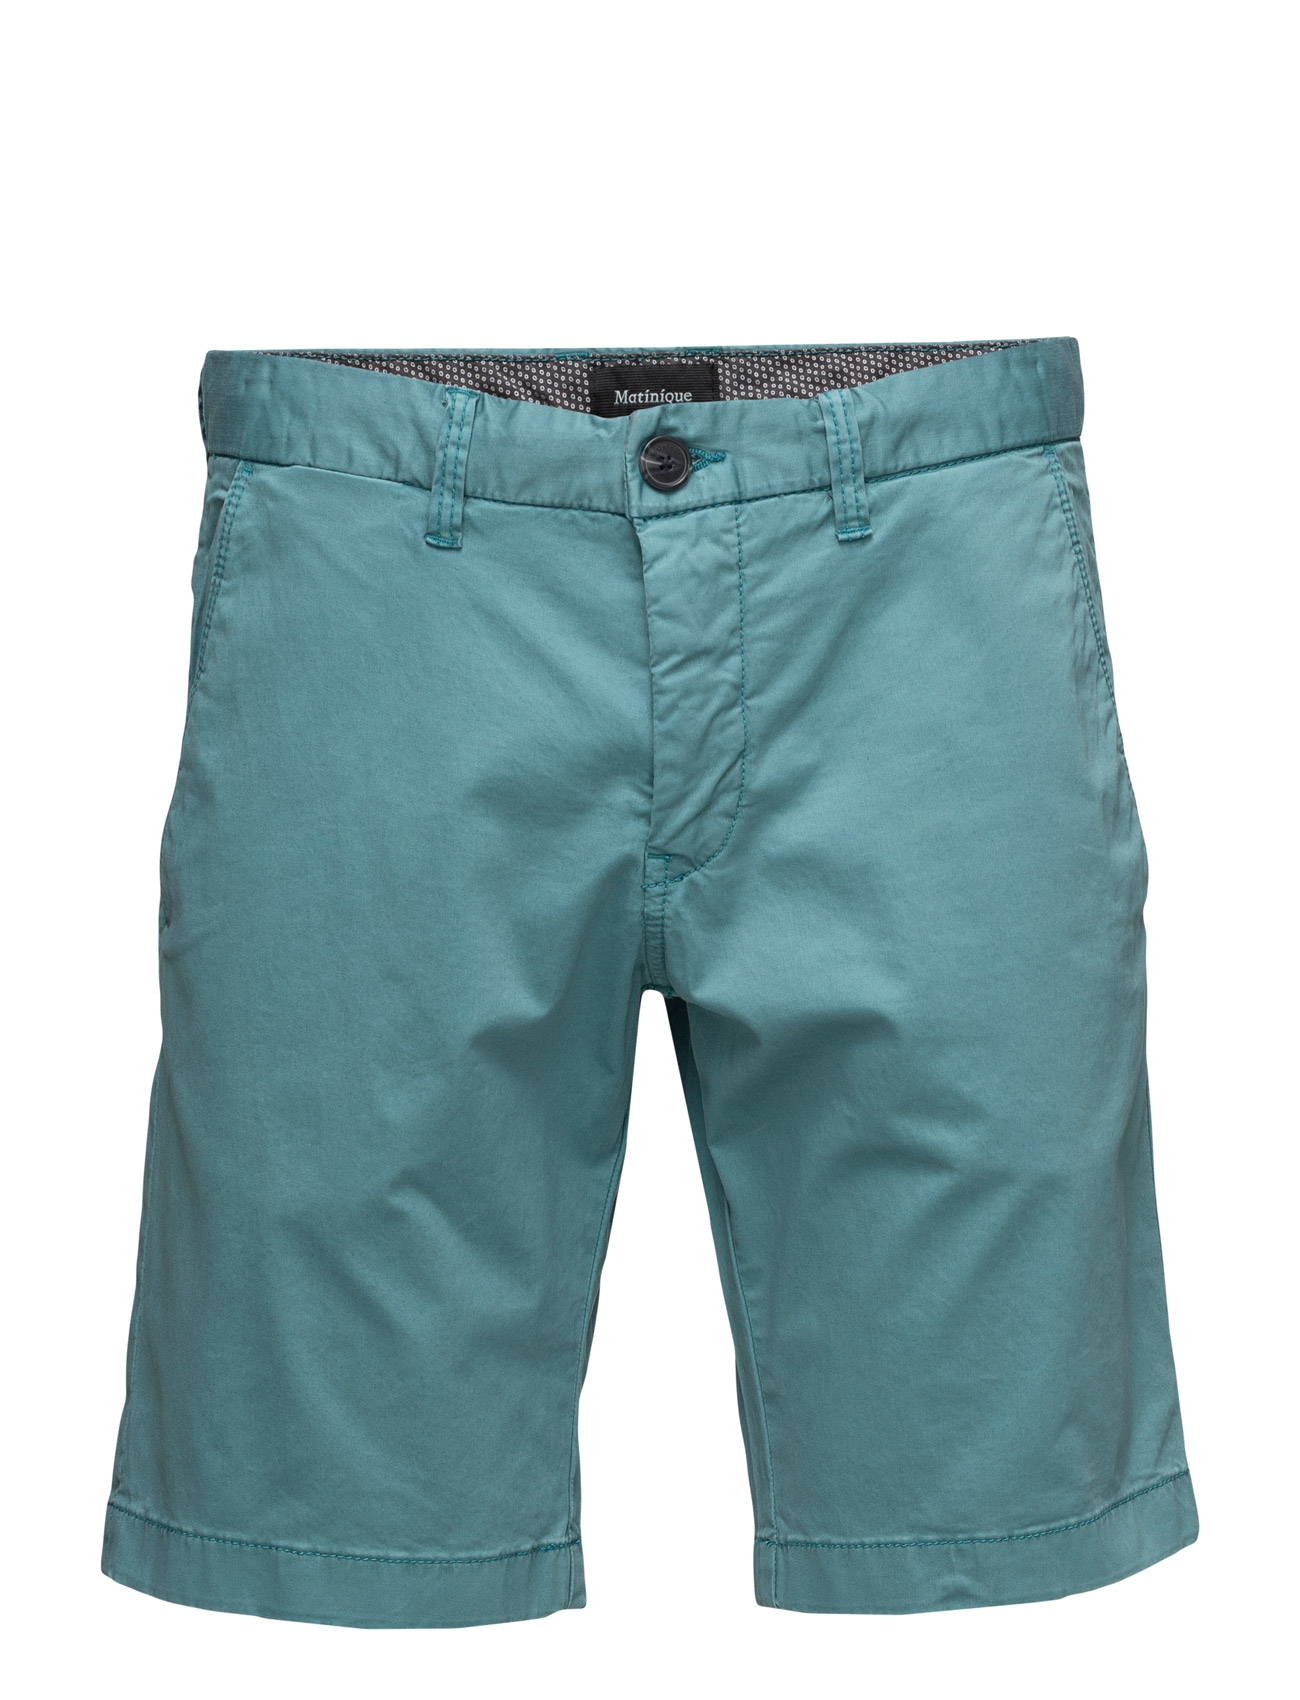 Pristu Sh Matinique Bermuda shorts til Herrer i